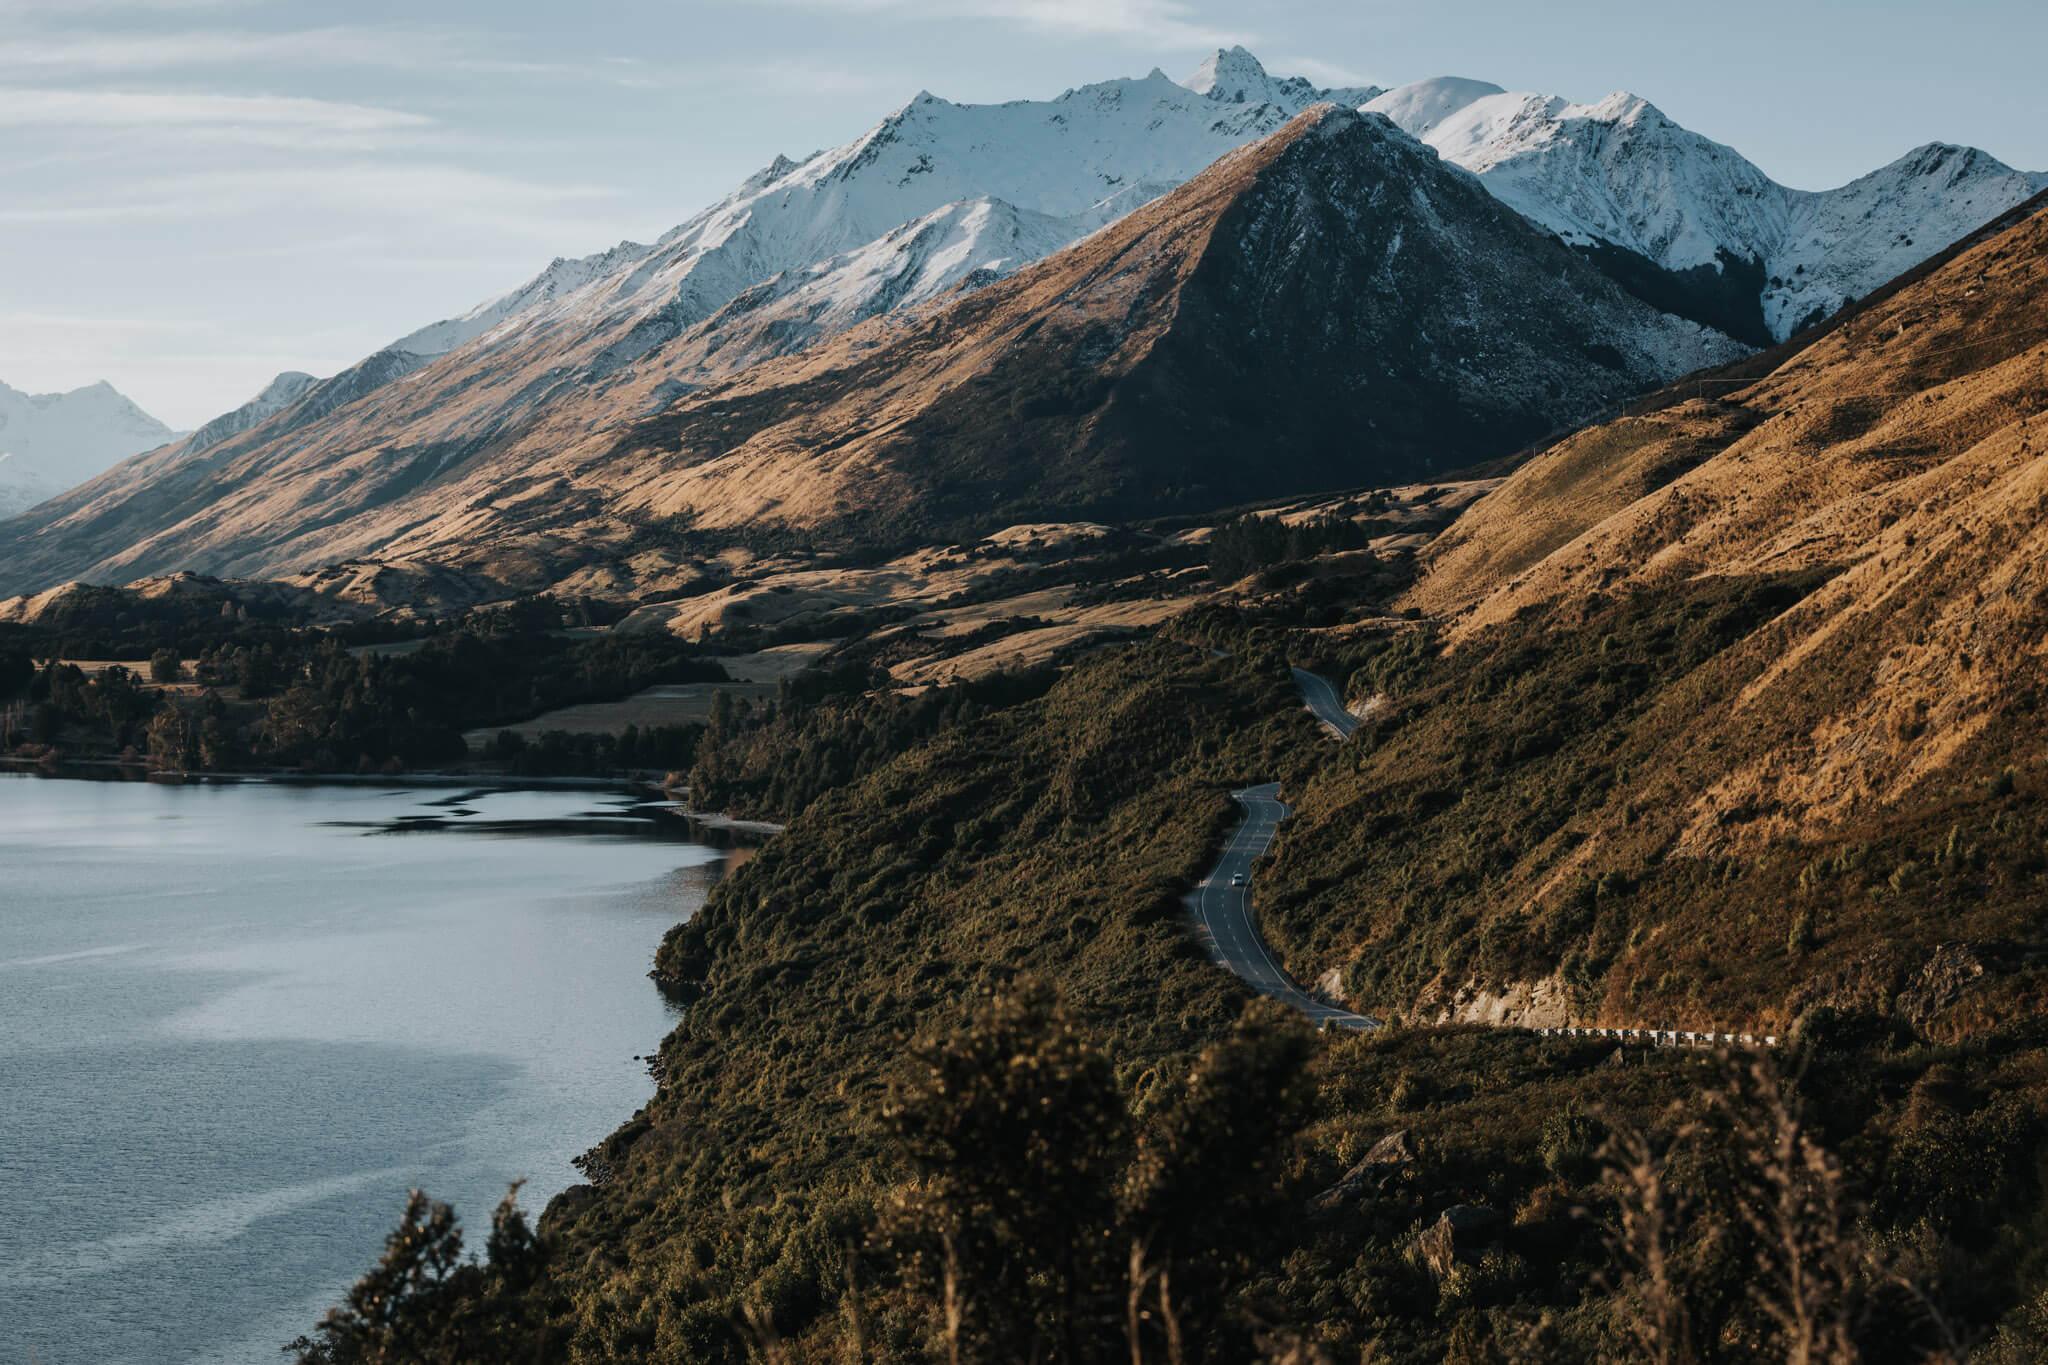 New-Zealand-Travel-Photography-Natalie-Skoric-17.jpg